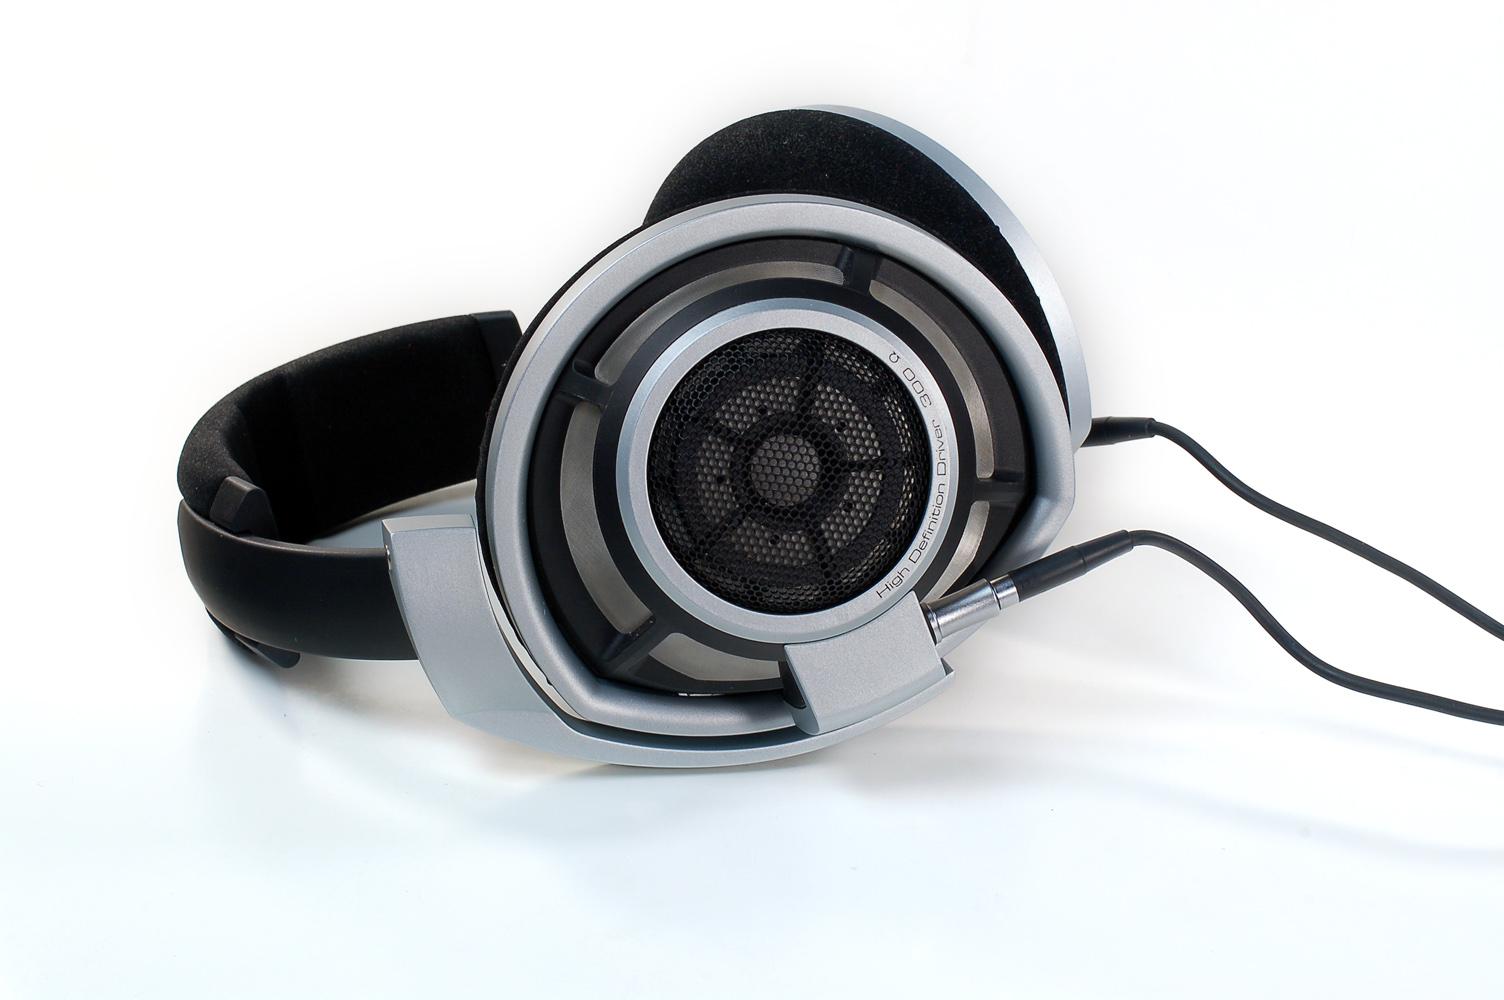 Sennheiser HD800 Over-Ear Headphones